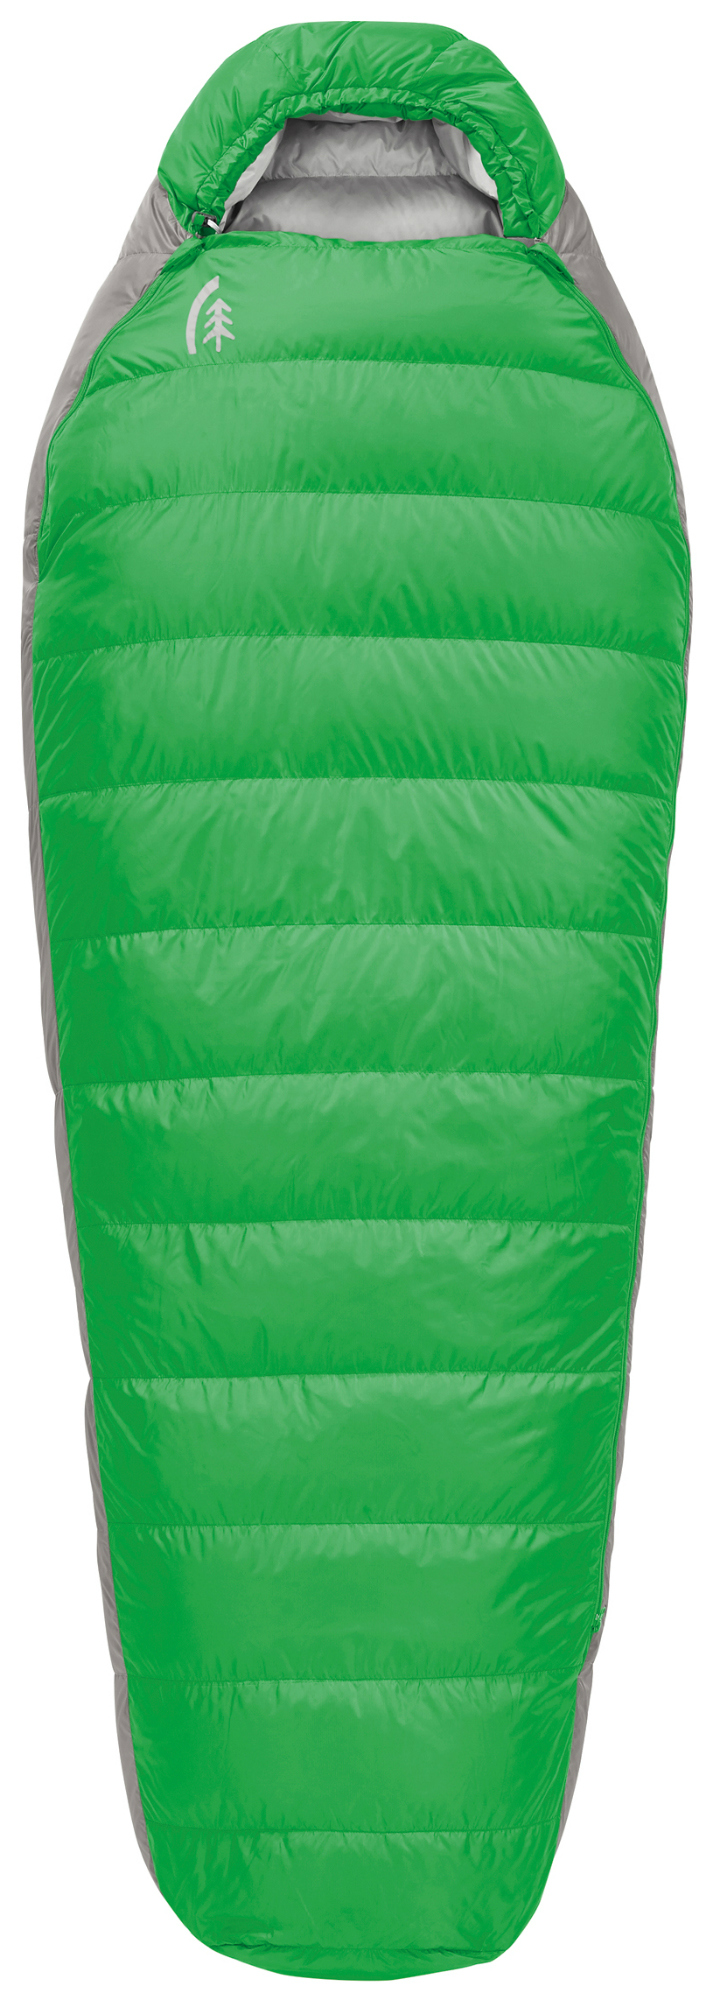 photo: Sierra Designs Zissou Plus 700 2-Season 3-season down sleeping bag